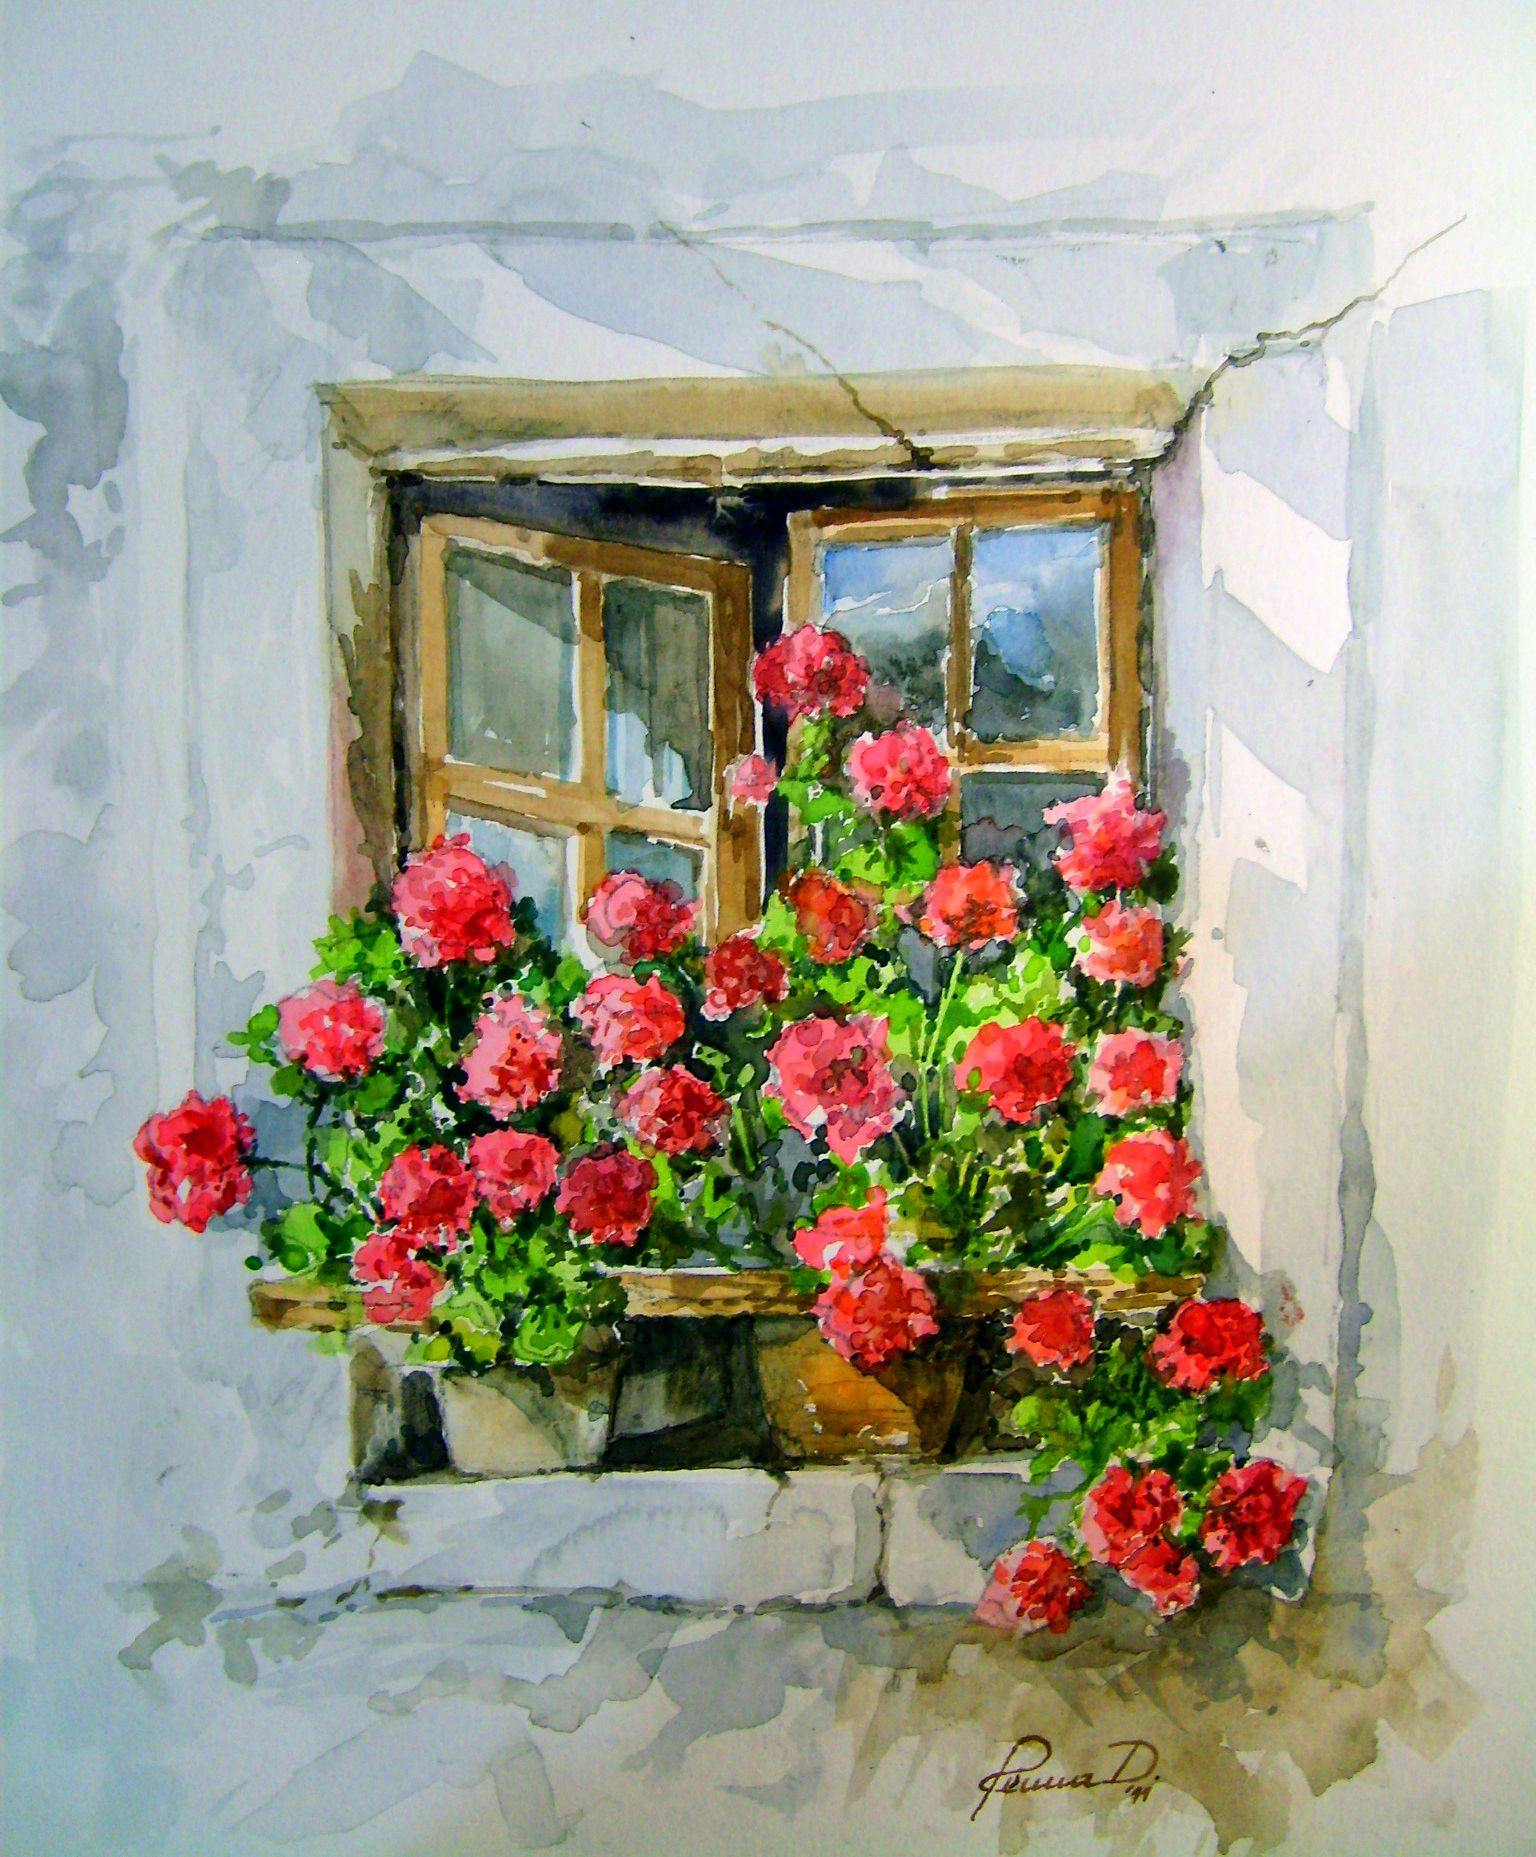 pin von nadia premuni auf watercolor   pinterest   aquarell, malen